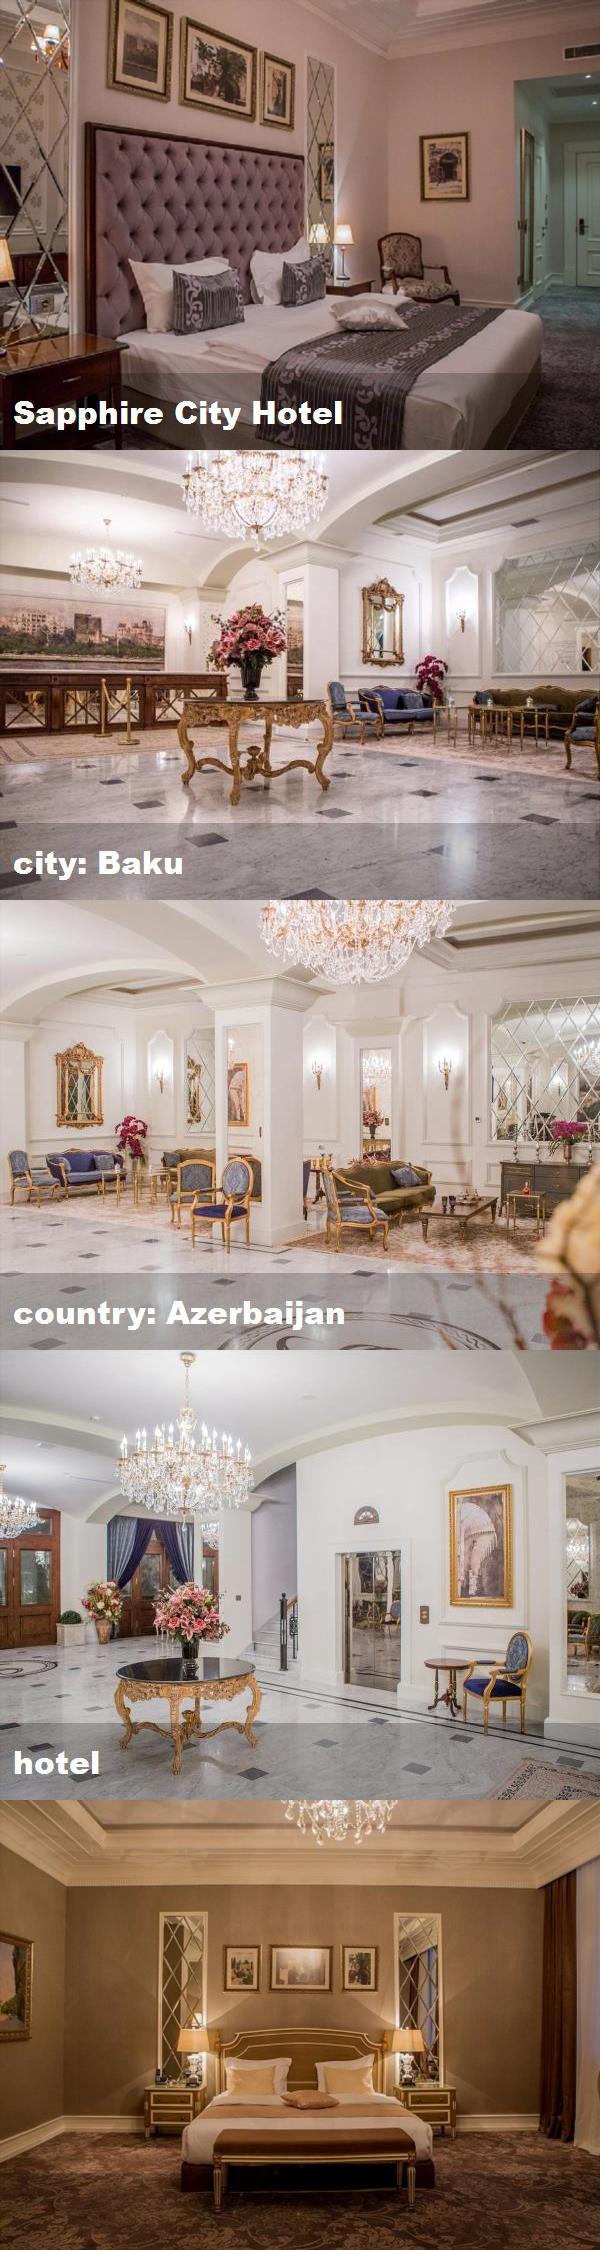 Sapphire City Hotel City Baku Country Azerbaijan Hotel City Hotel Hotel House Styles